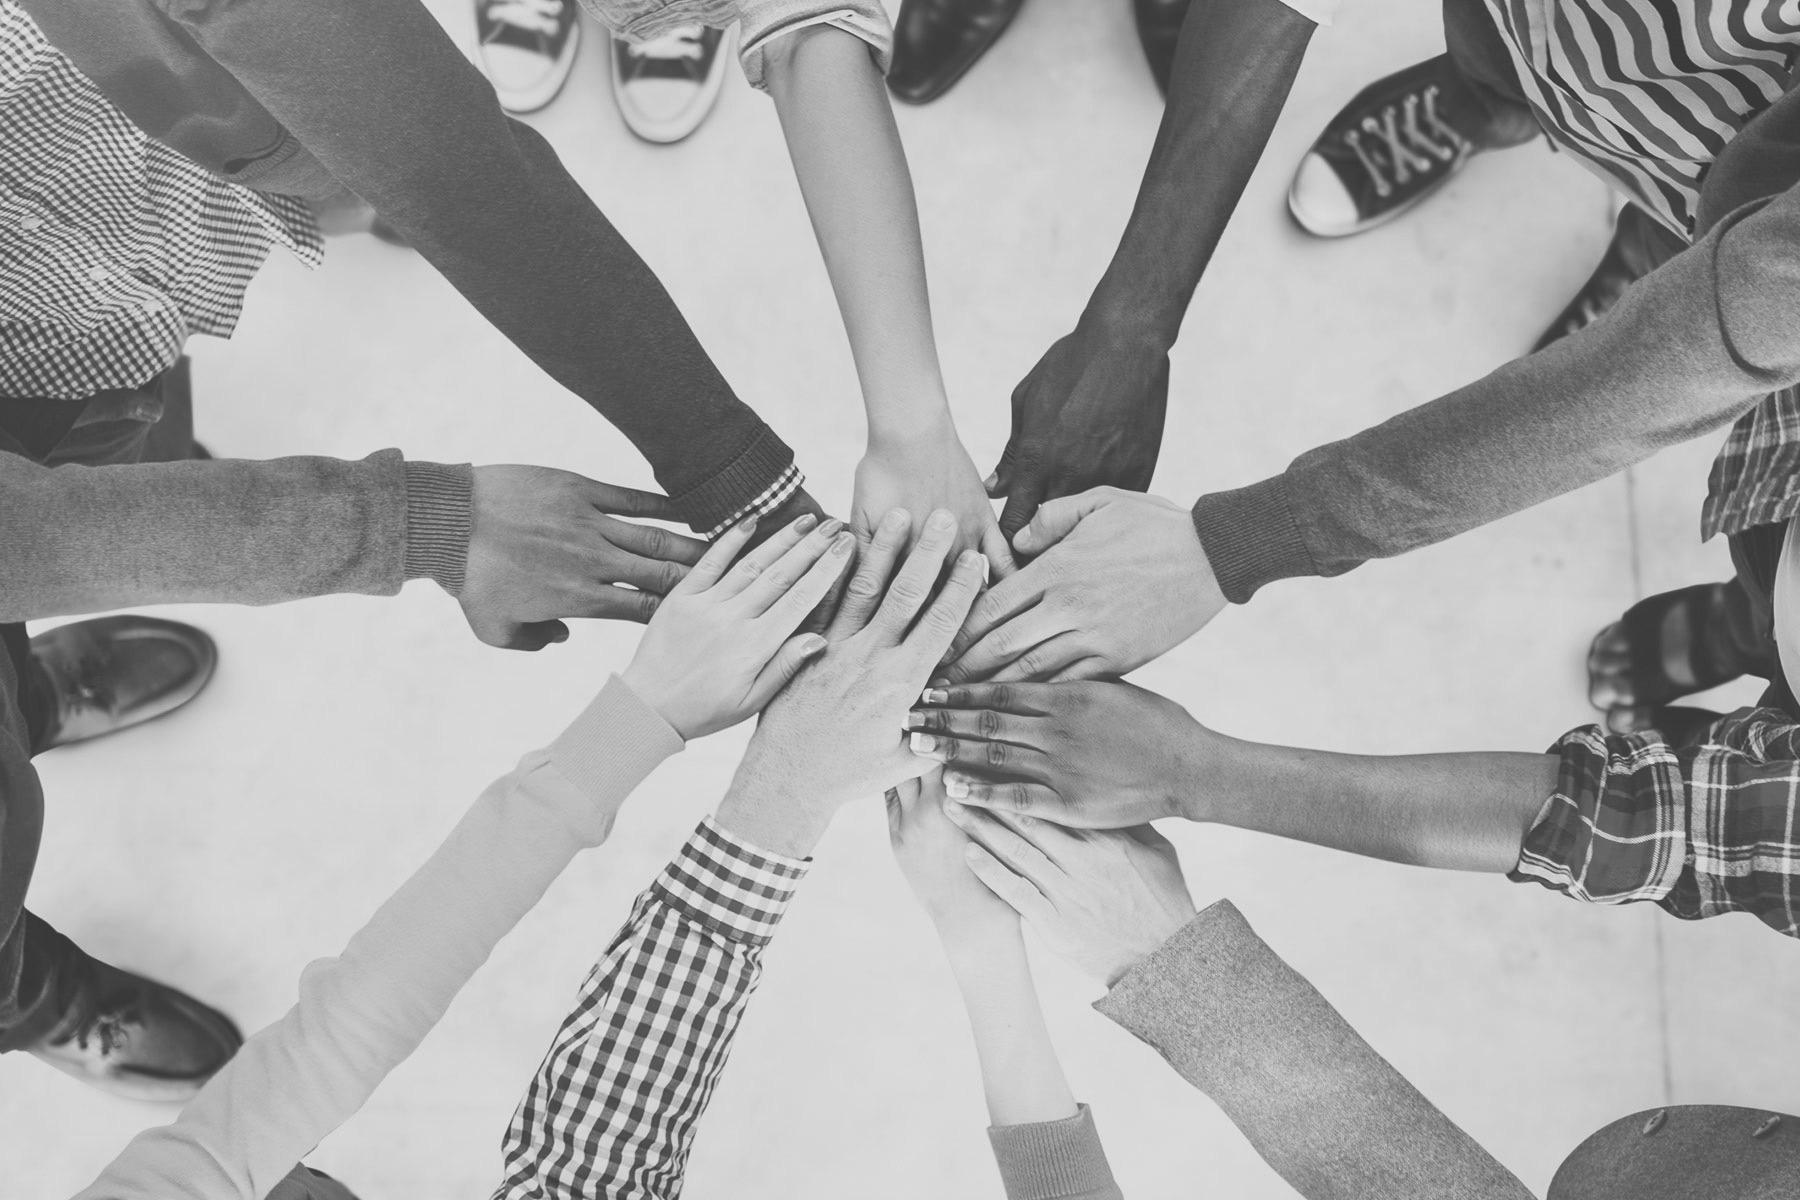 organisation-creation-team-building-incentive